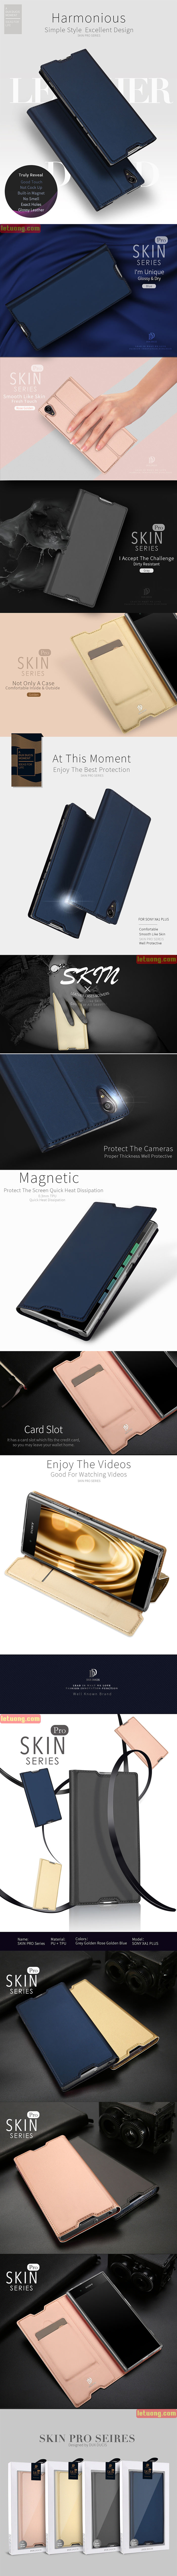 Bao da Sony XA1 Plus Dux Ducis Skin khung mềm, siêu mỏng 5